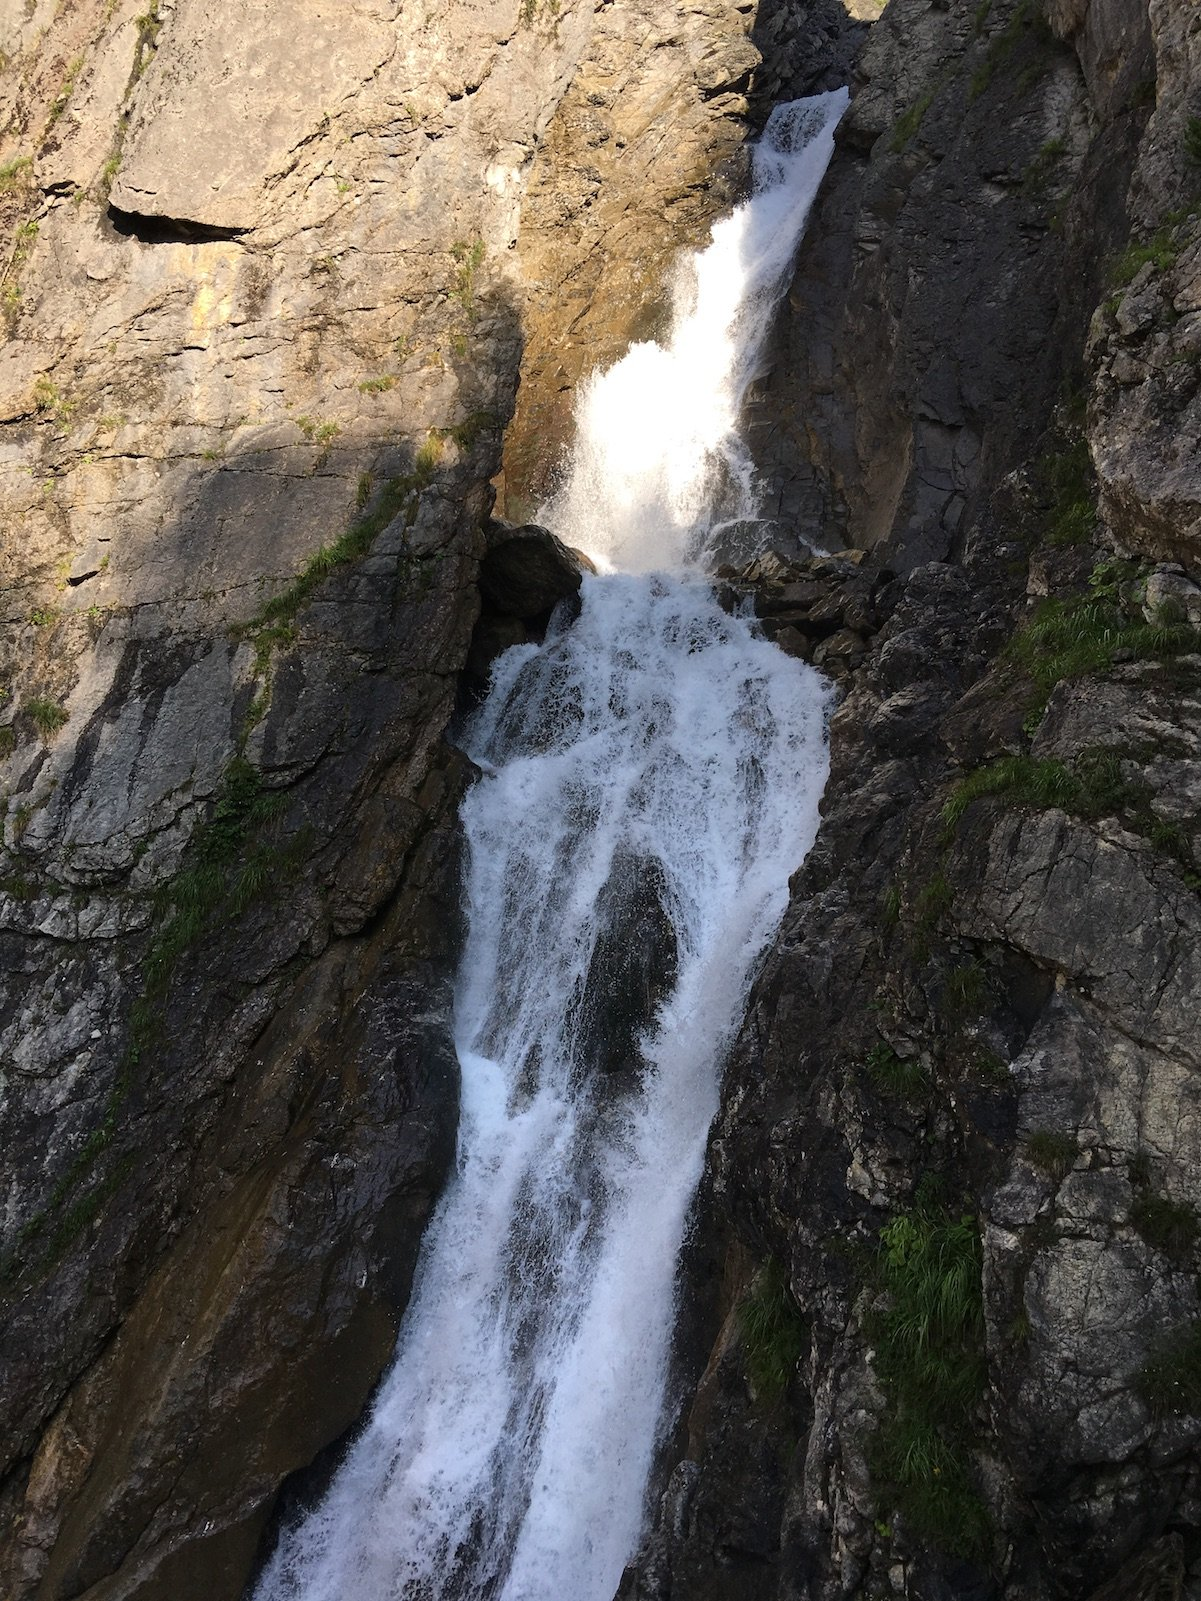 Simmswasserfall